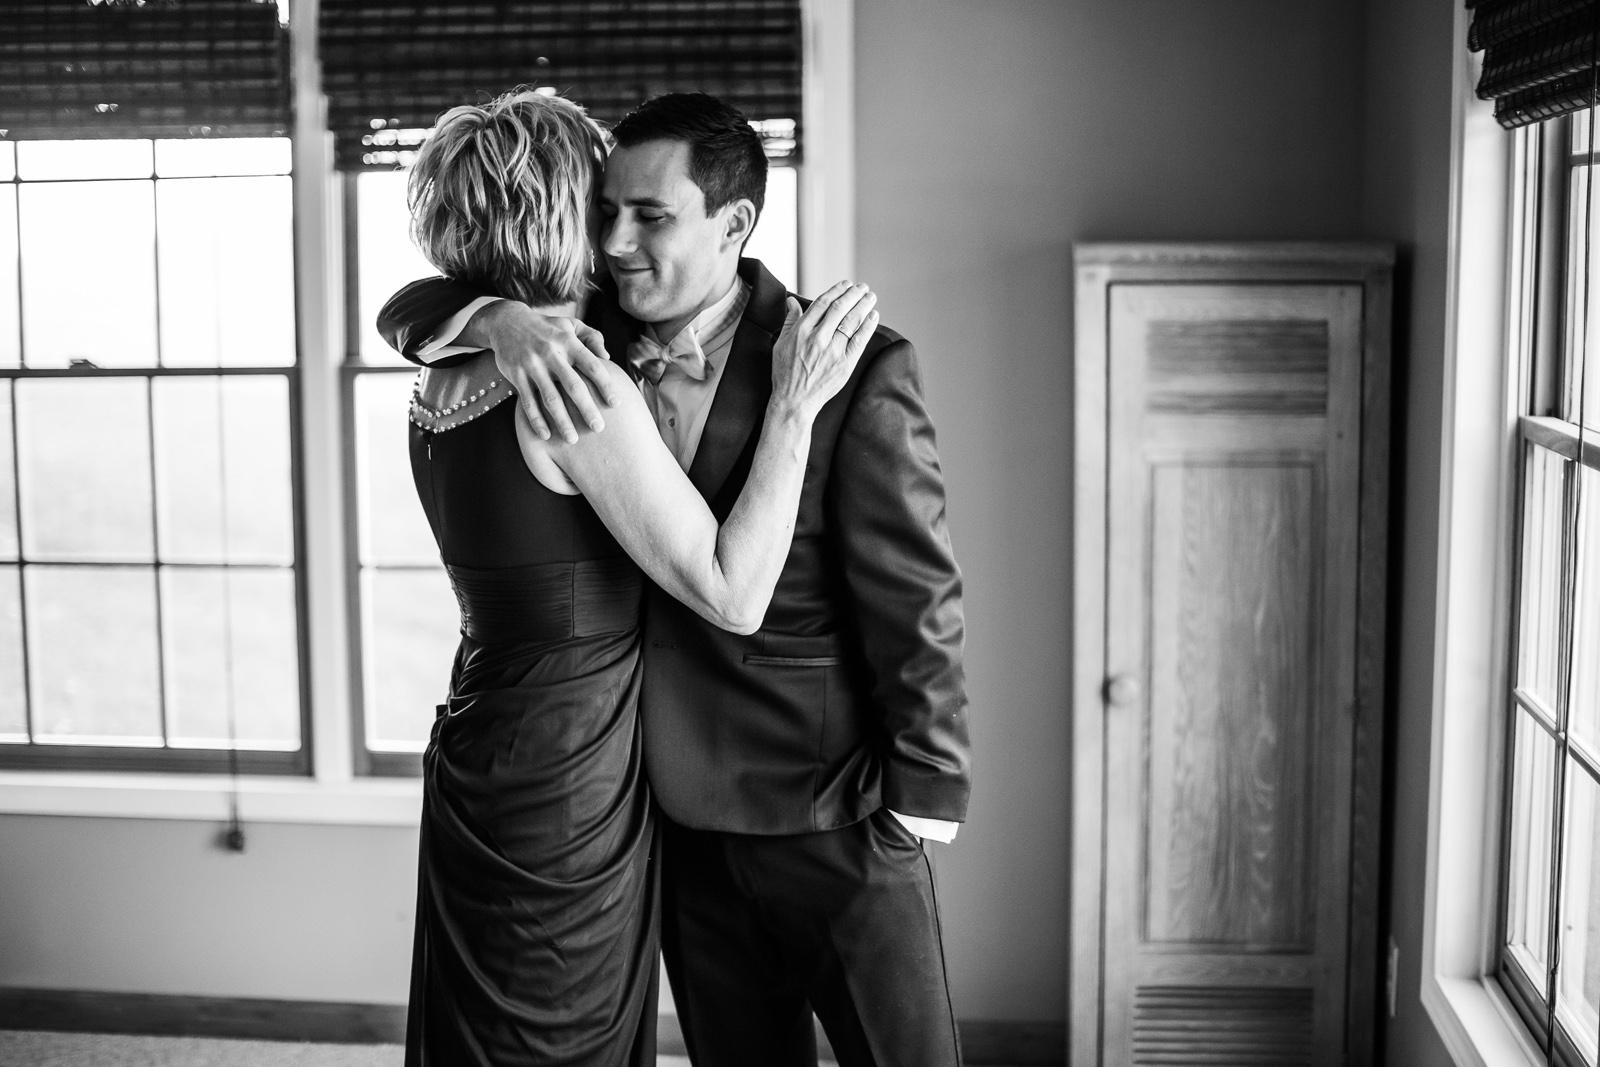 St Louis Winter Wedding Photography_20141115_12115091.jpg